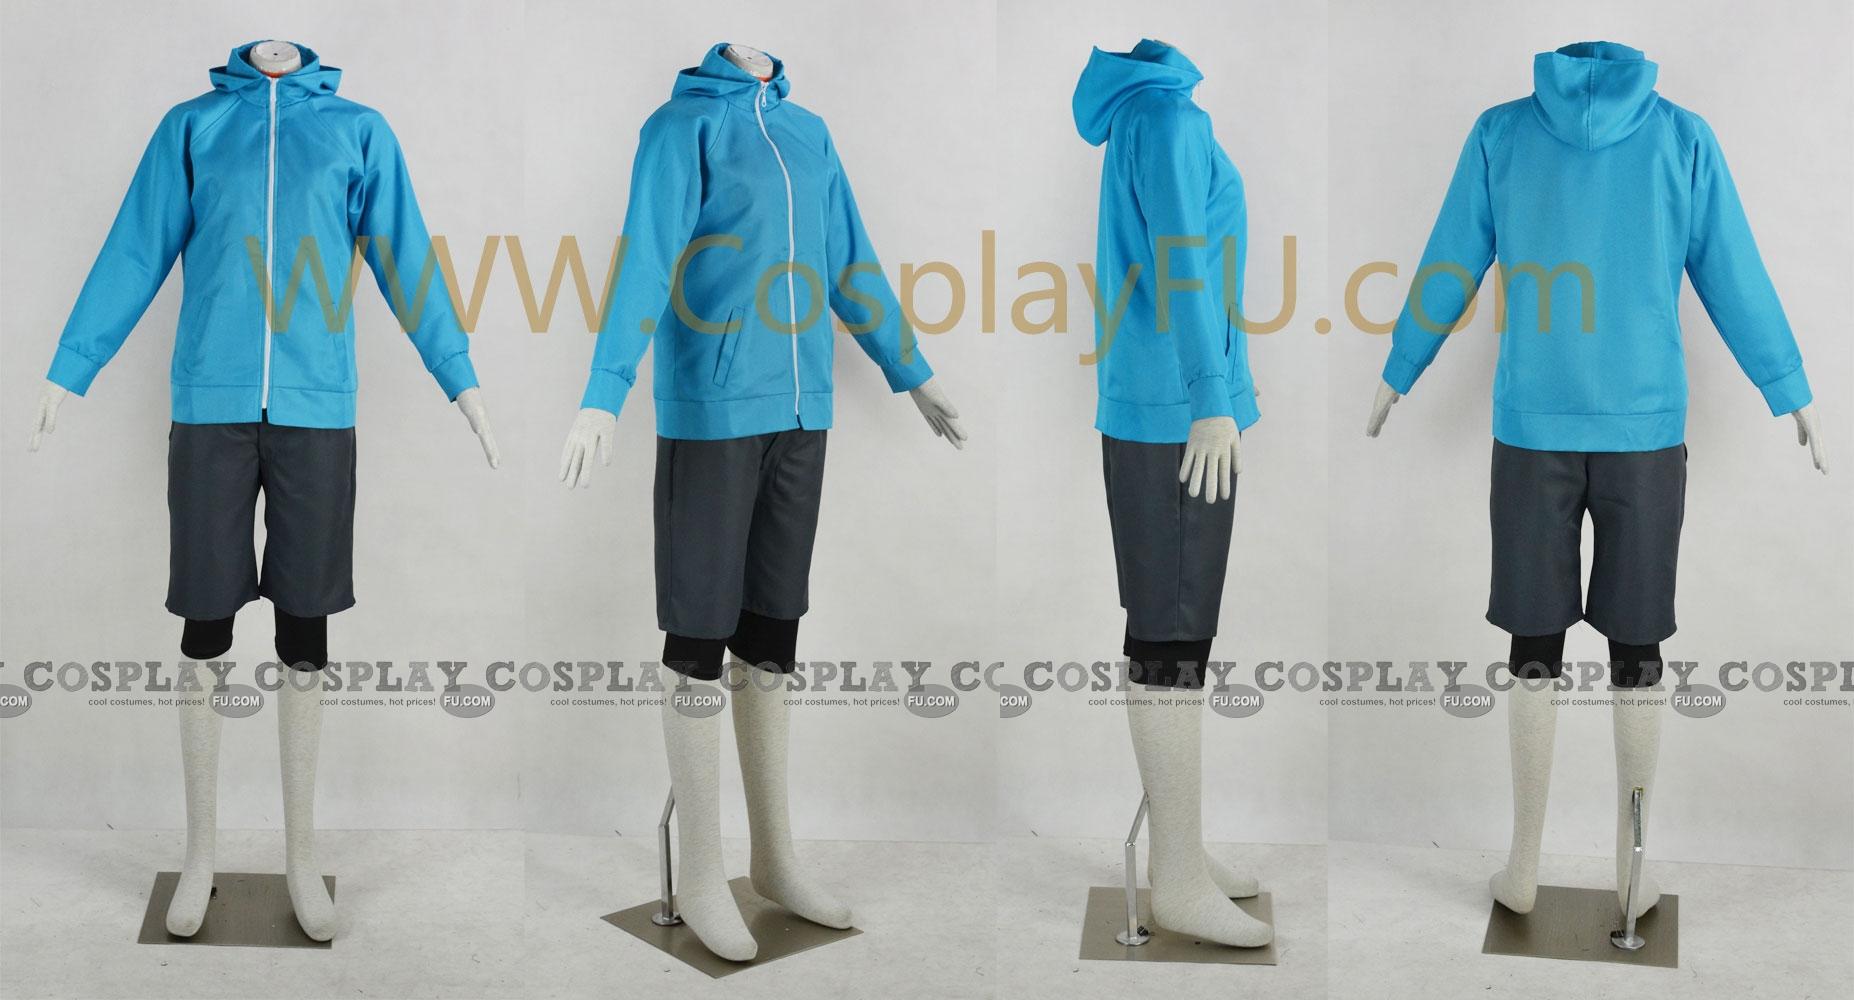 Ao Cosplay Costume from Eureka Seven AO